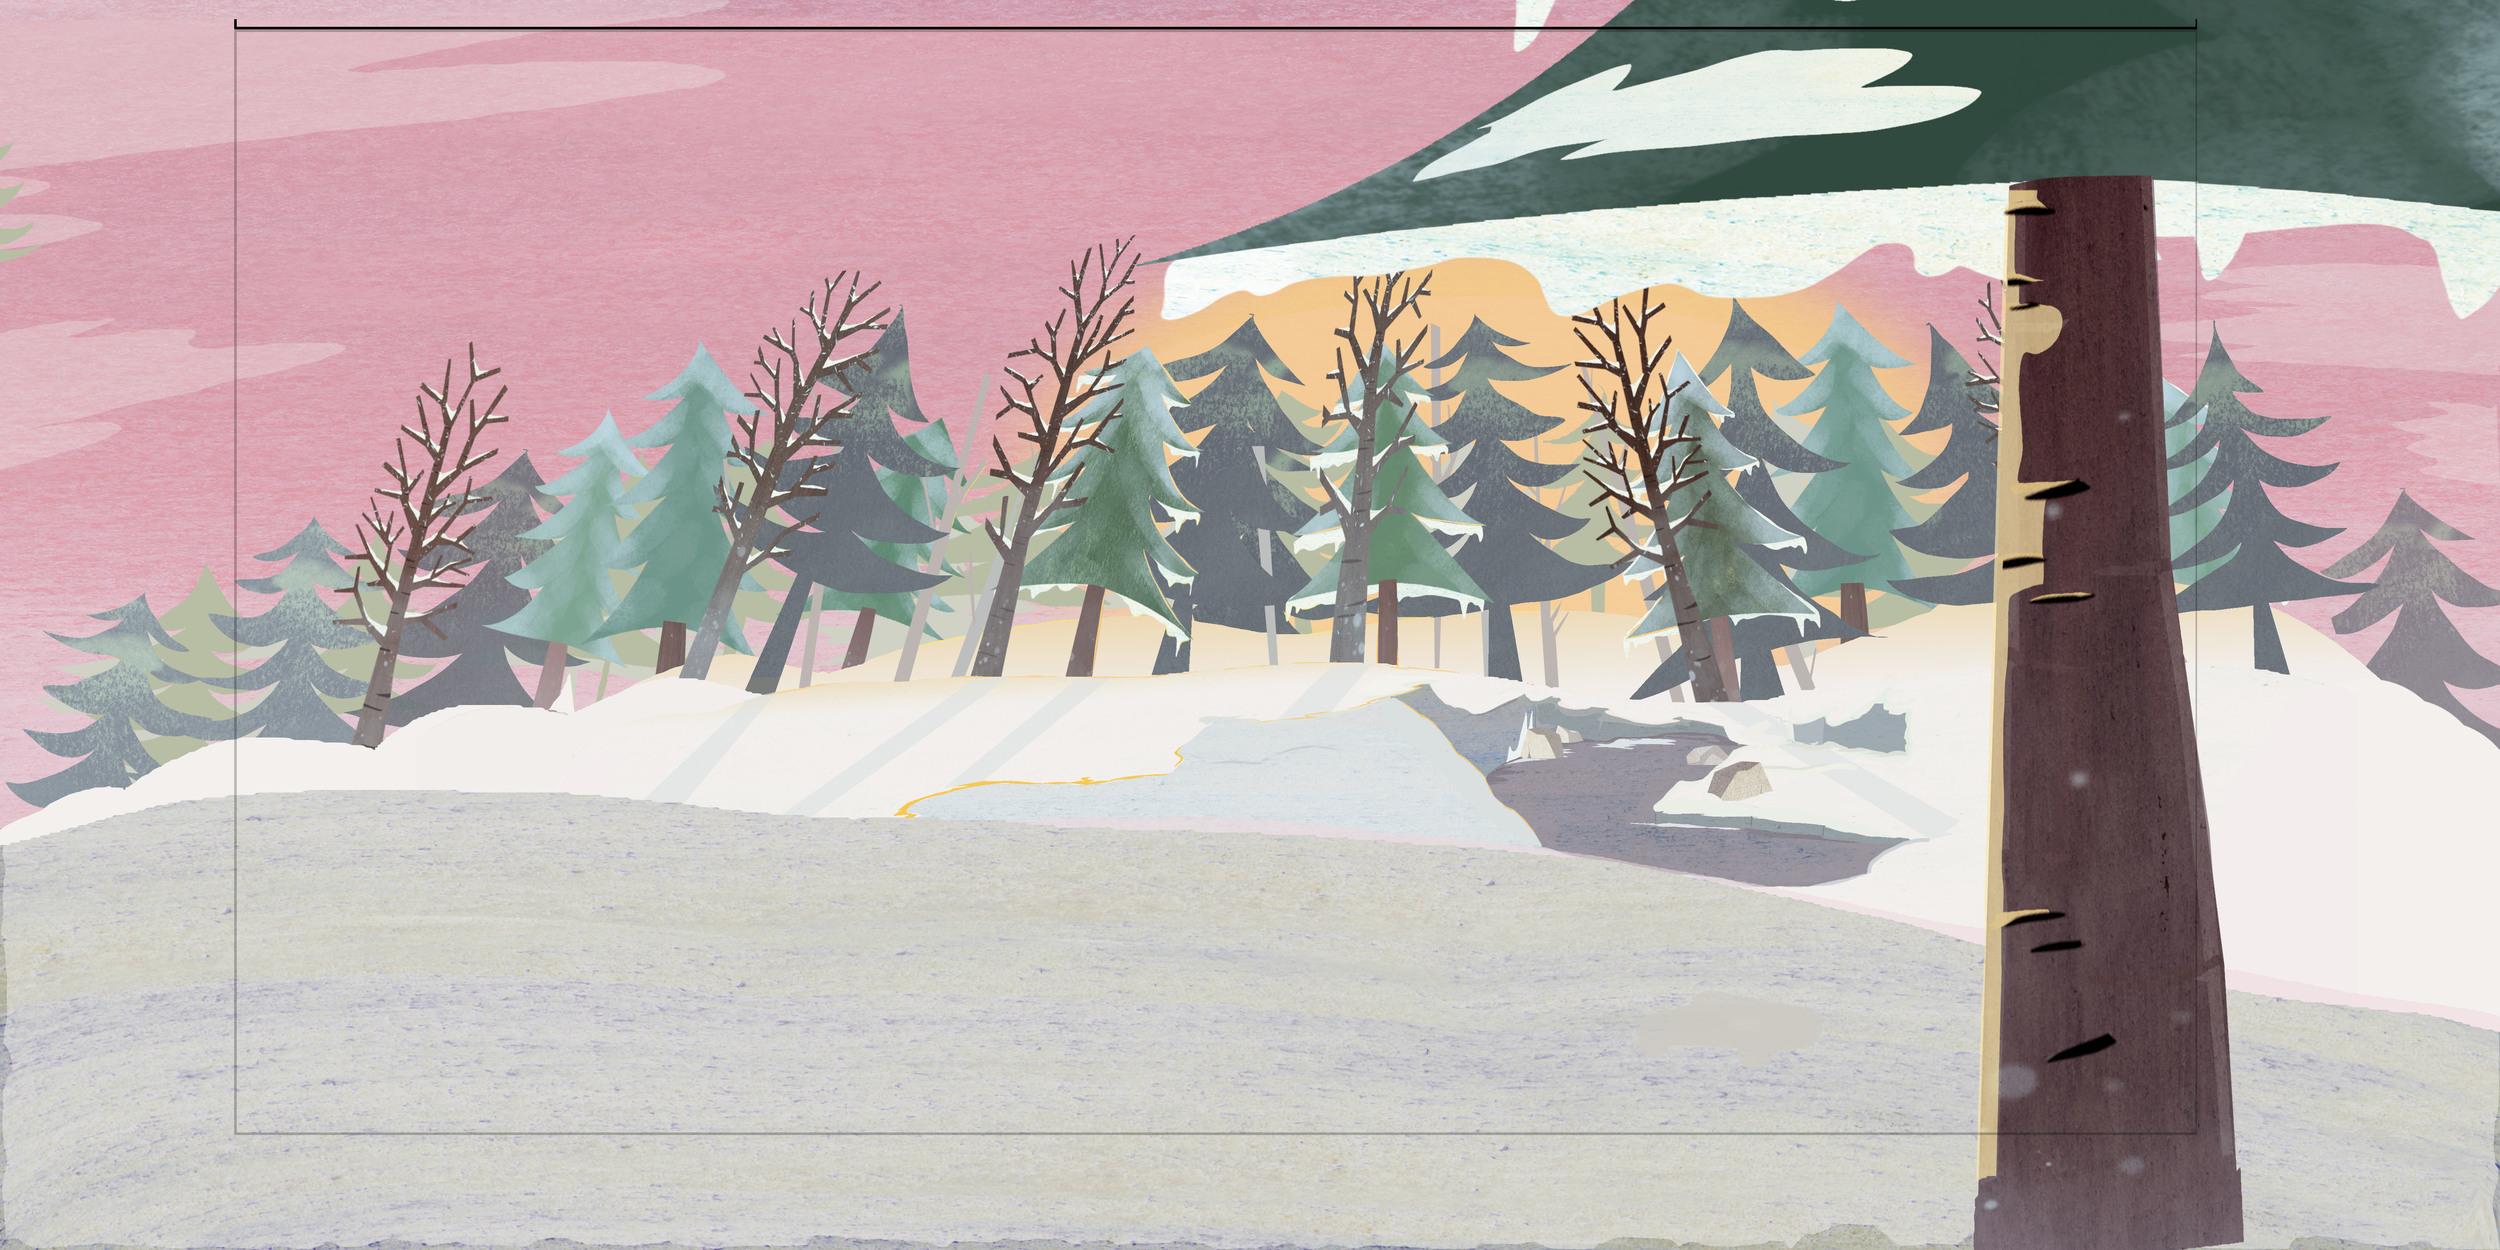 Winter_S04_Sc16_MORNING(Shira).jpg